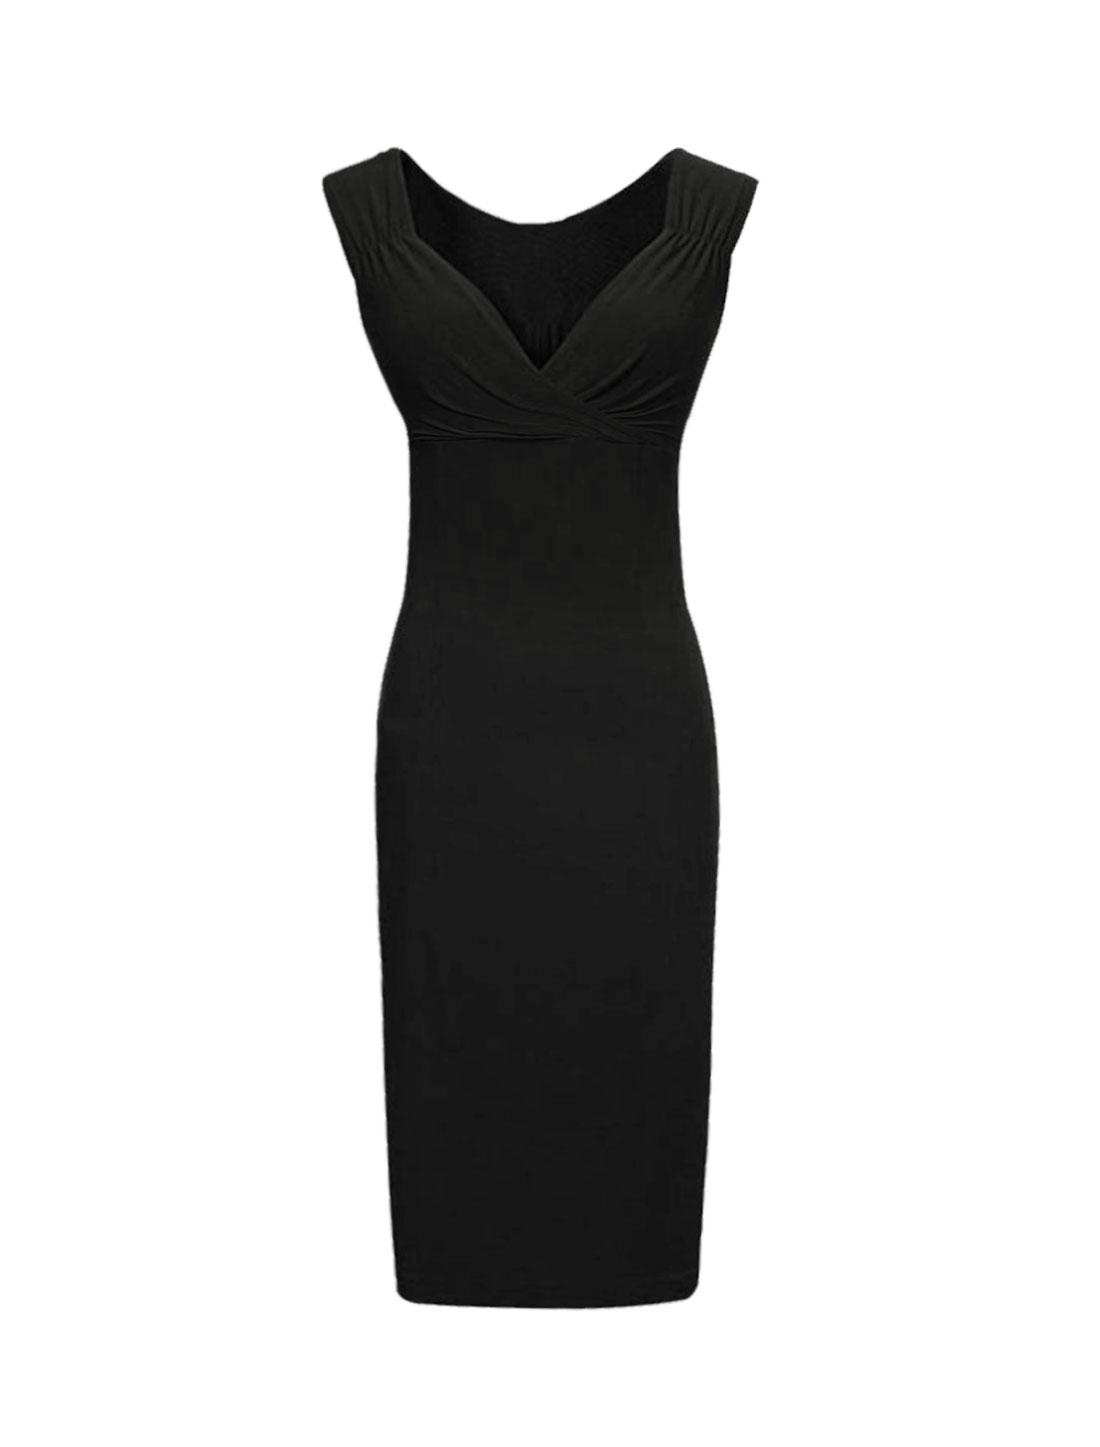 Women Crossover V Neck Ruched Sleeveless Pencil Dress Black XL